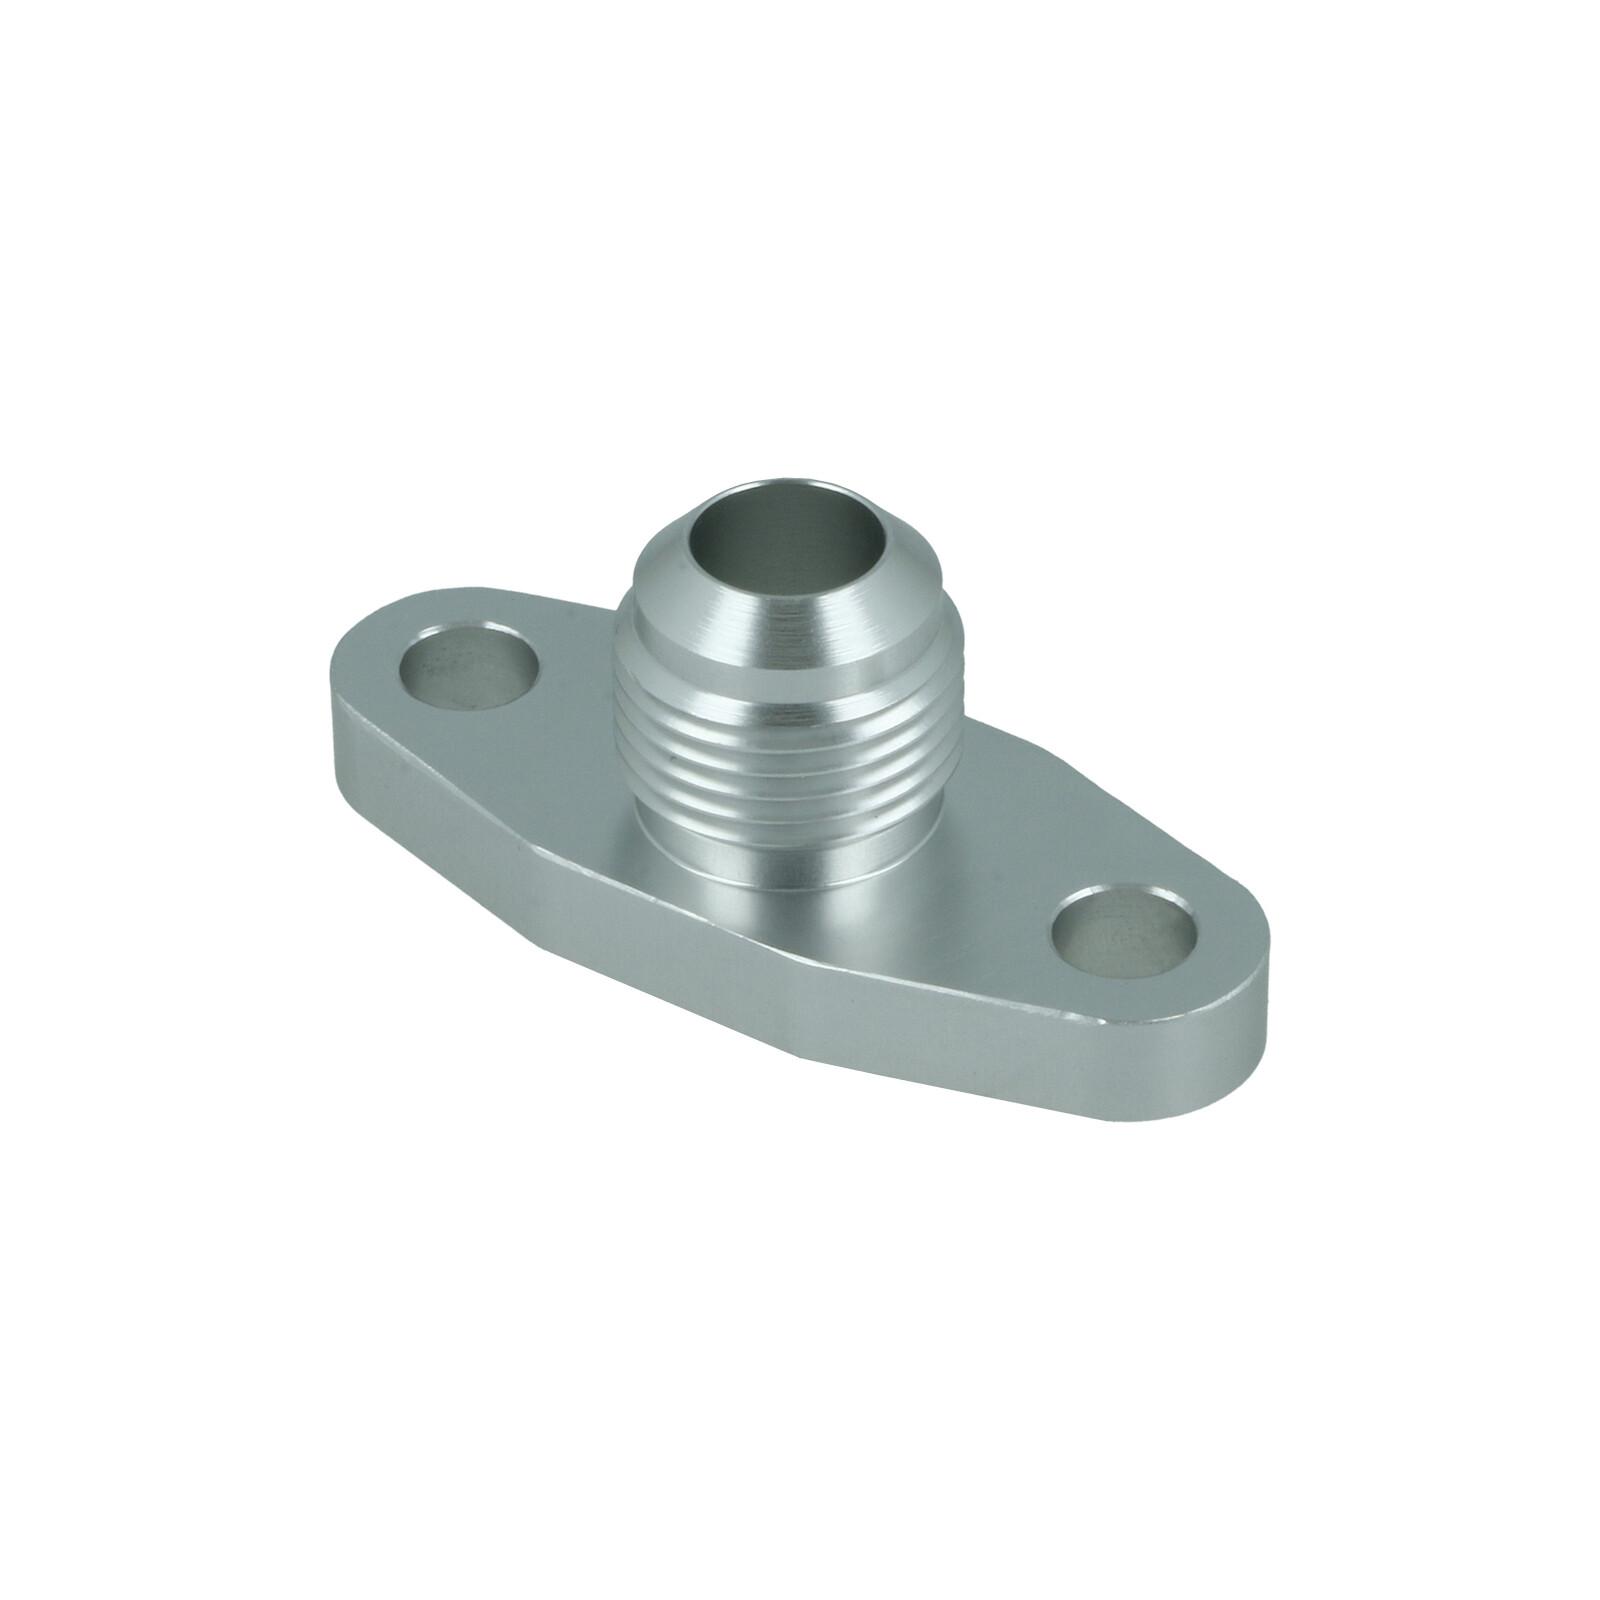 YN20P01034P2 Fuel Cap SINOCMP Locking Fuel Cap with 2 keys for Kobelco Excavator SK100 SK200 SK300 SK160 SK250 SK330 SK480 SK260 Key Fuel Tank Cap 3 Month Warranty